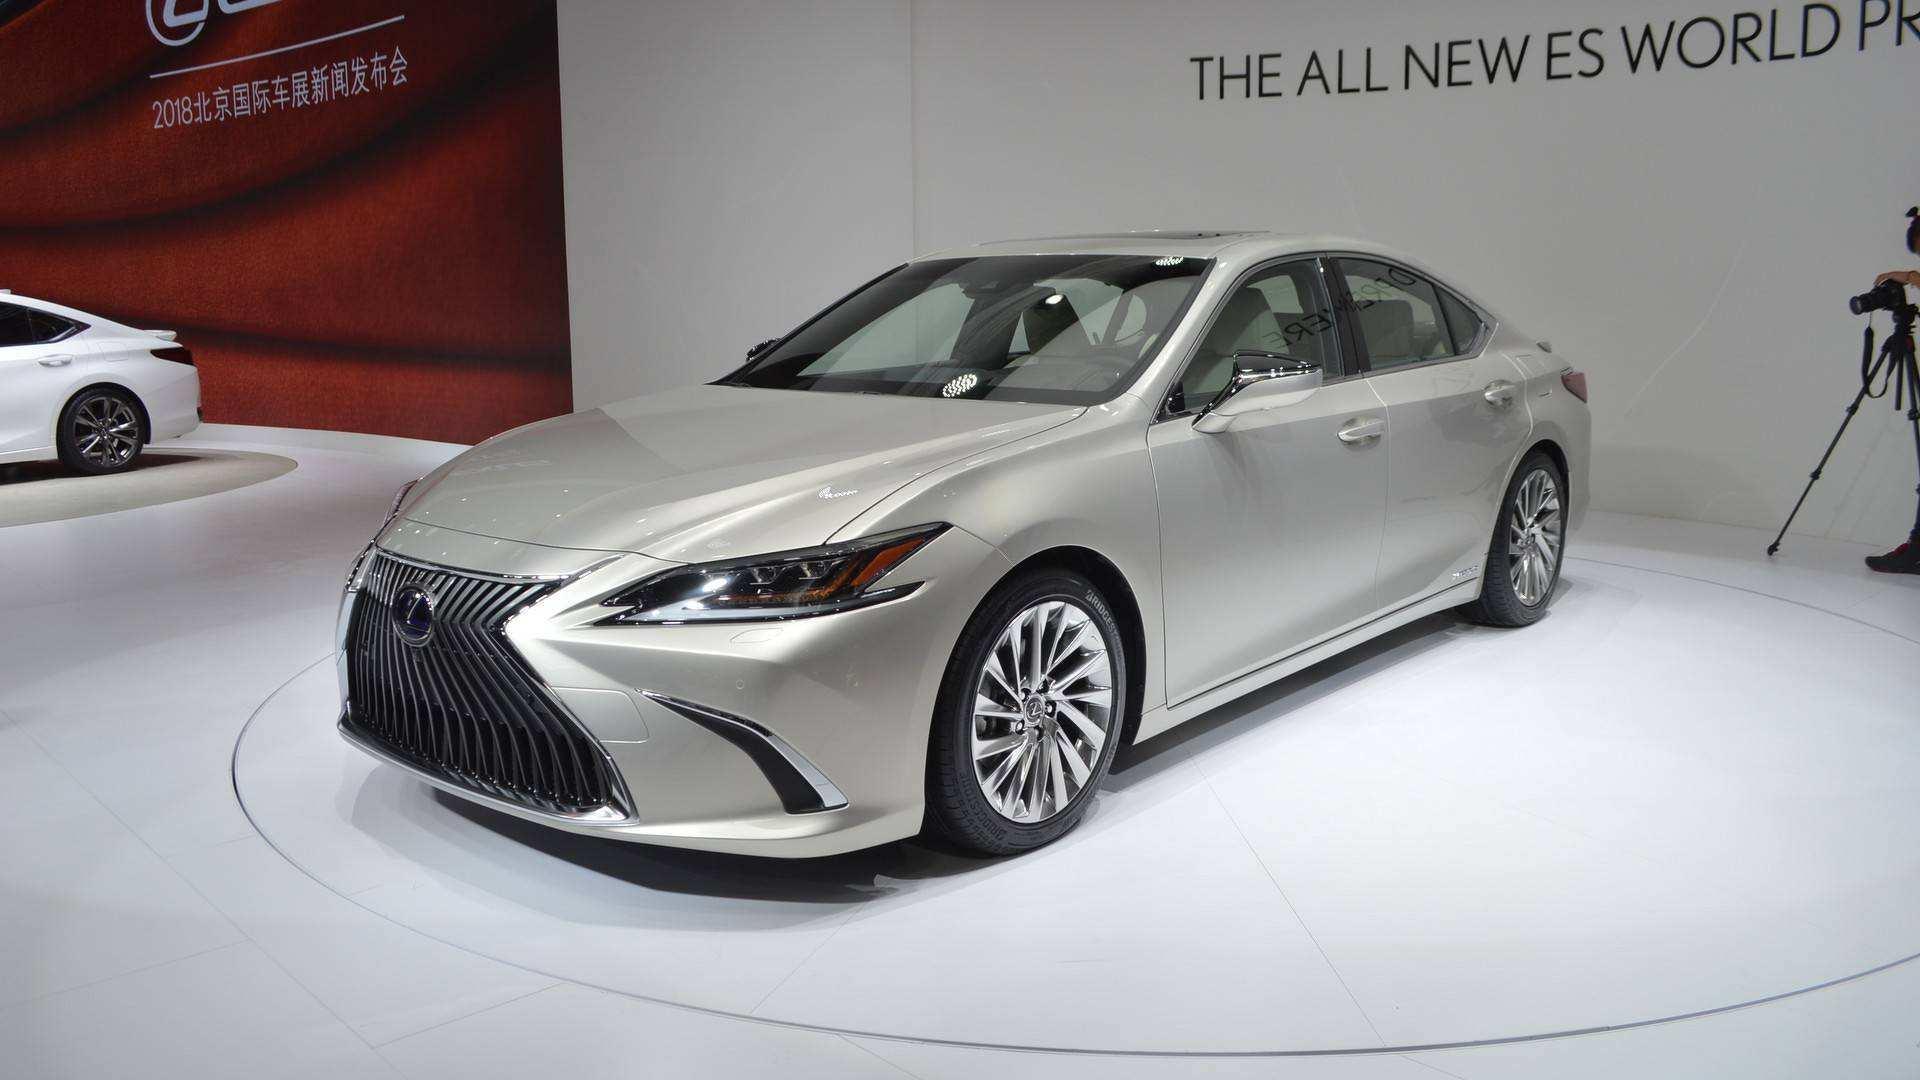 77 All New 2019 Lexus Es Hybrid Engine with 2019 Lexus Es Hybrid